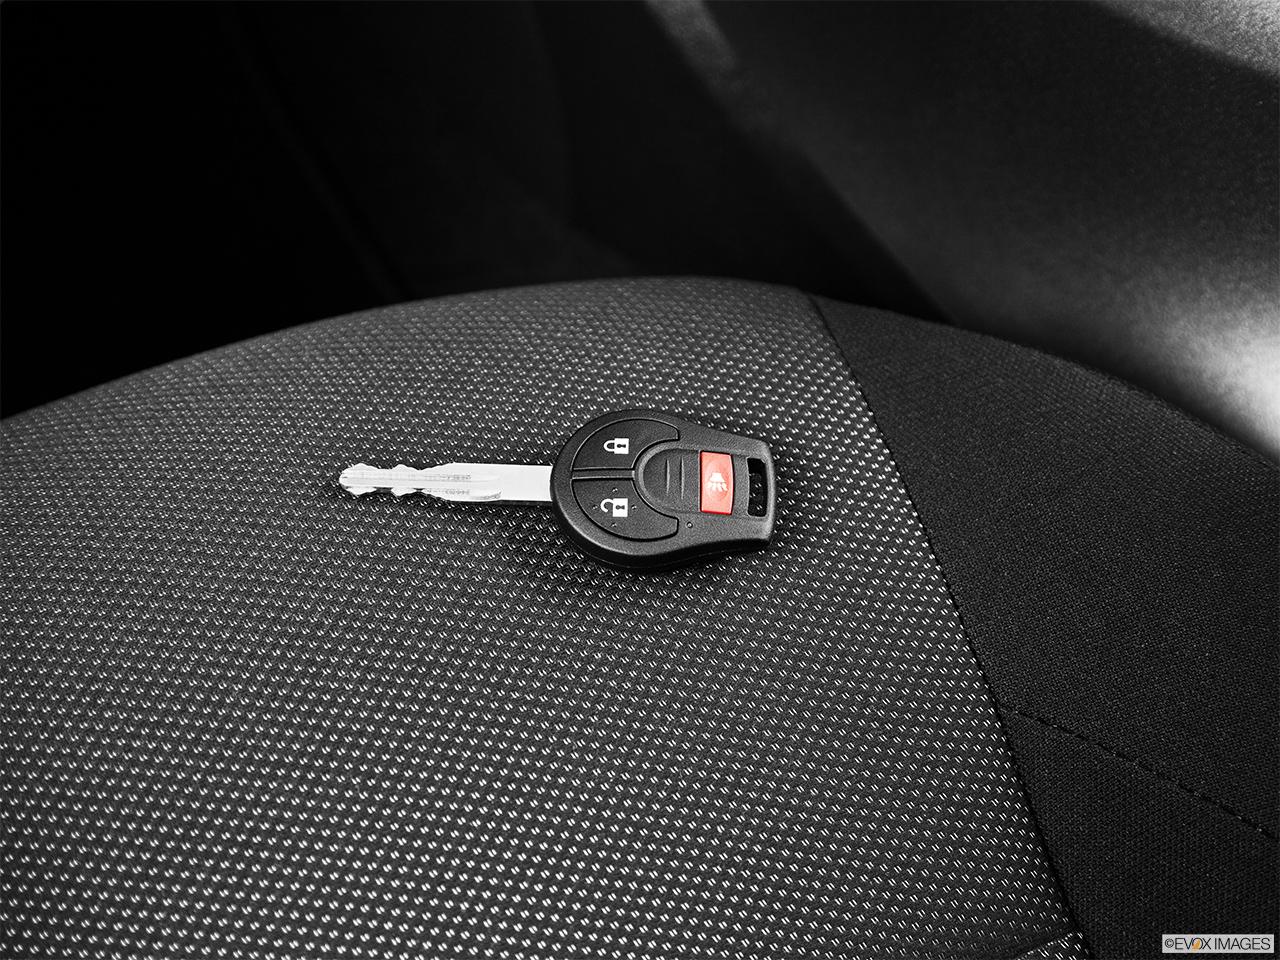 2014 Nissan Juke Wagon Cvt Sv Awd Key Fob On Driver S Seat